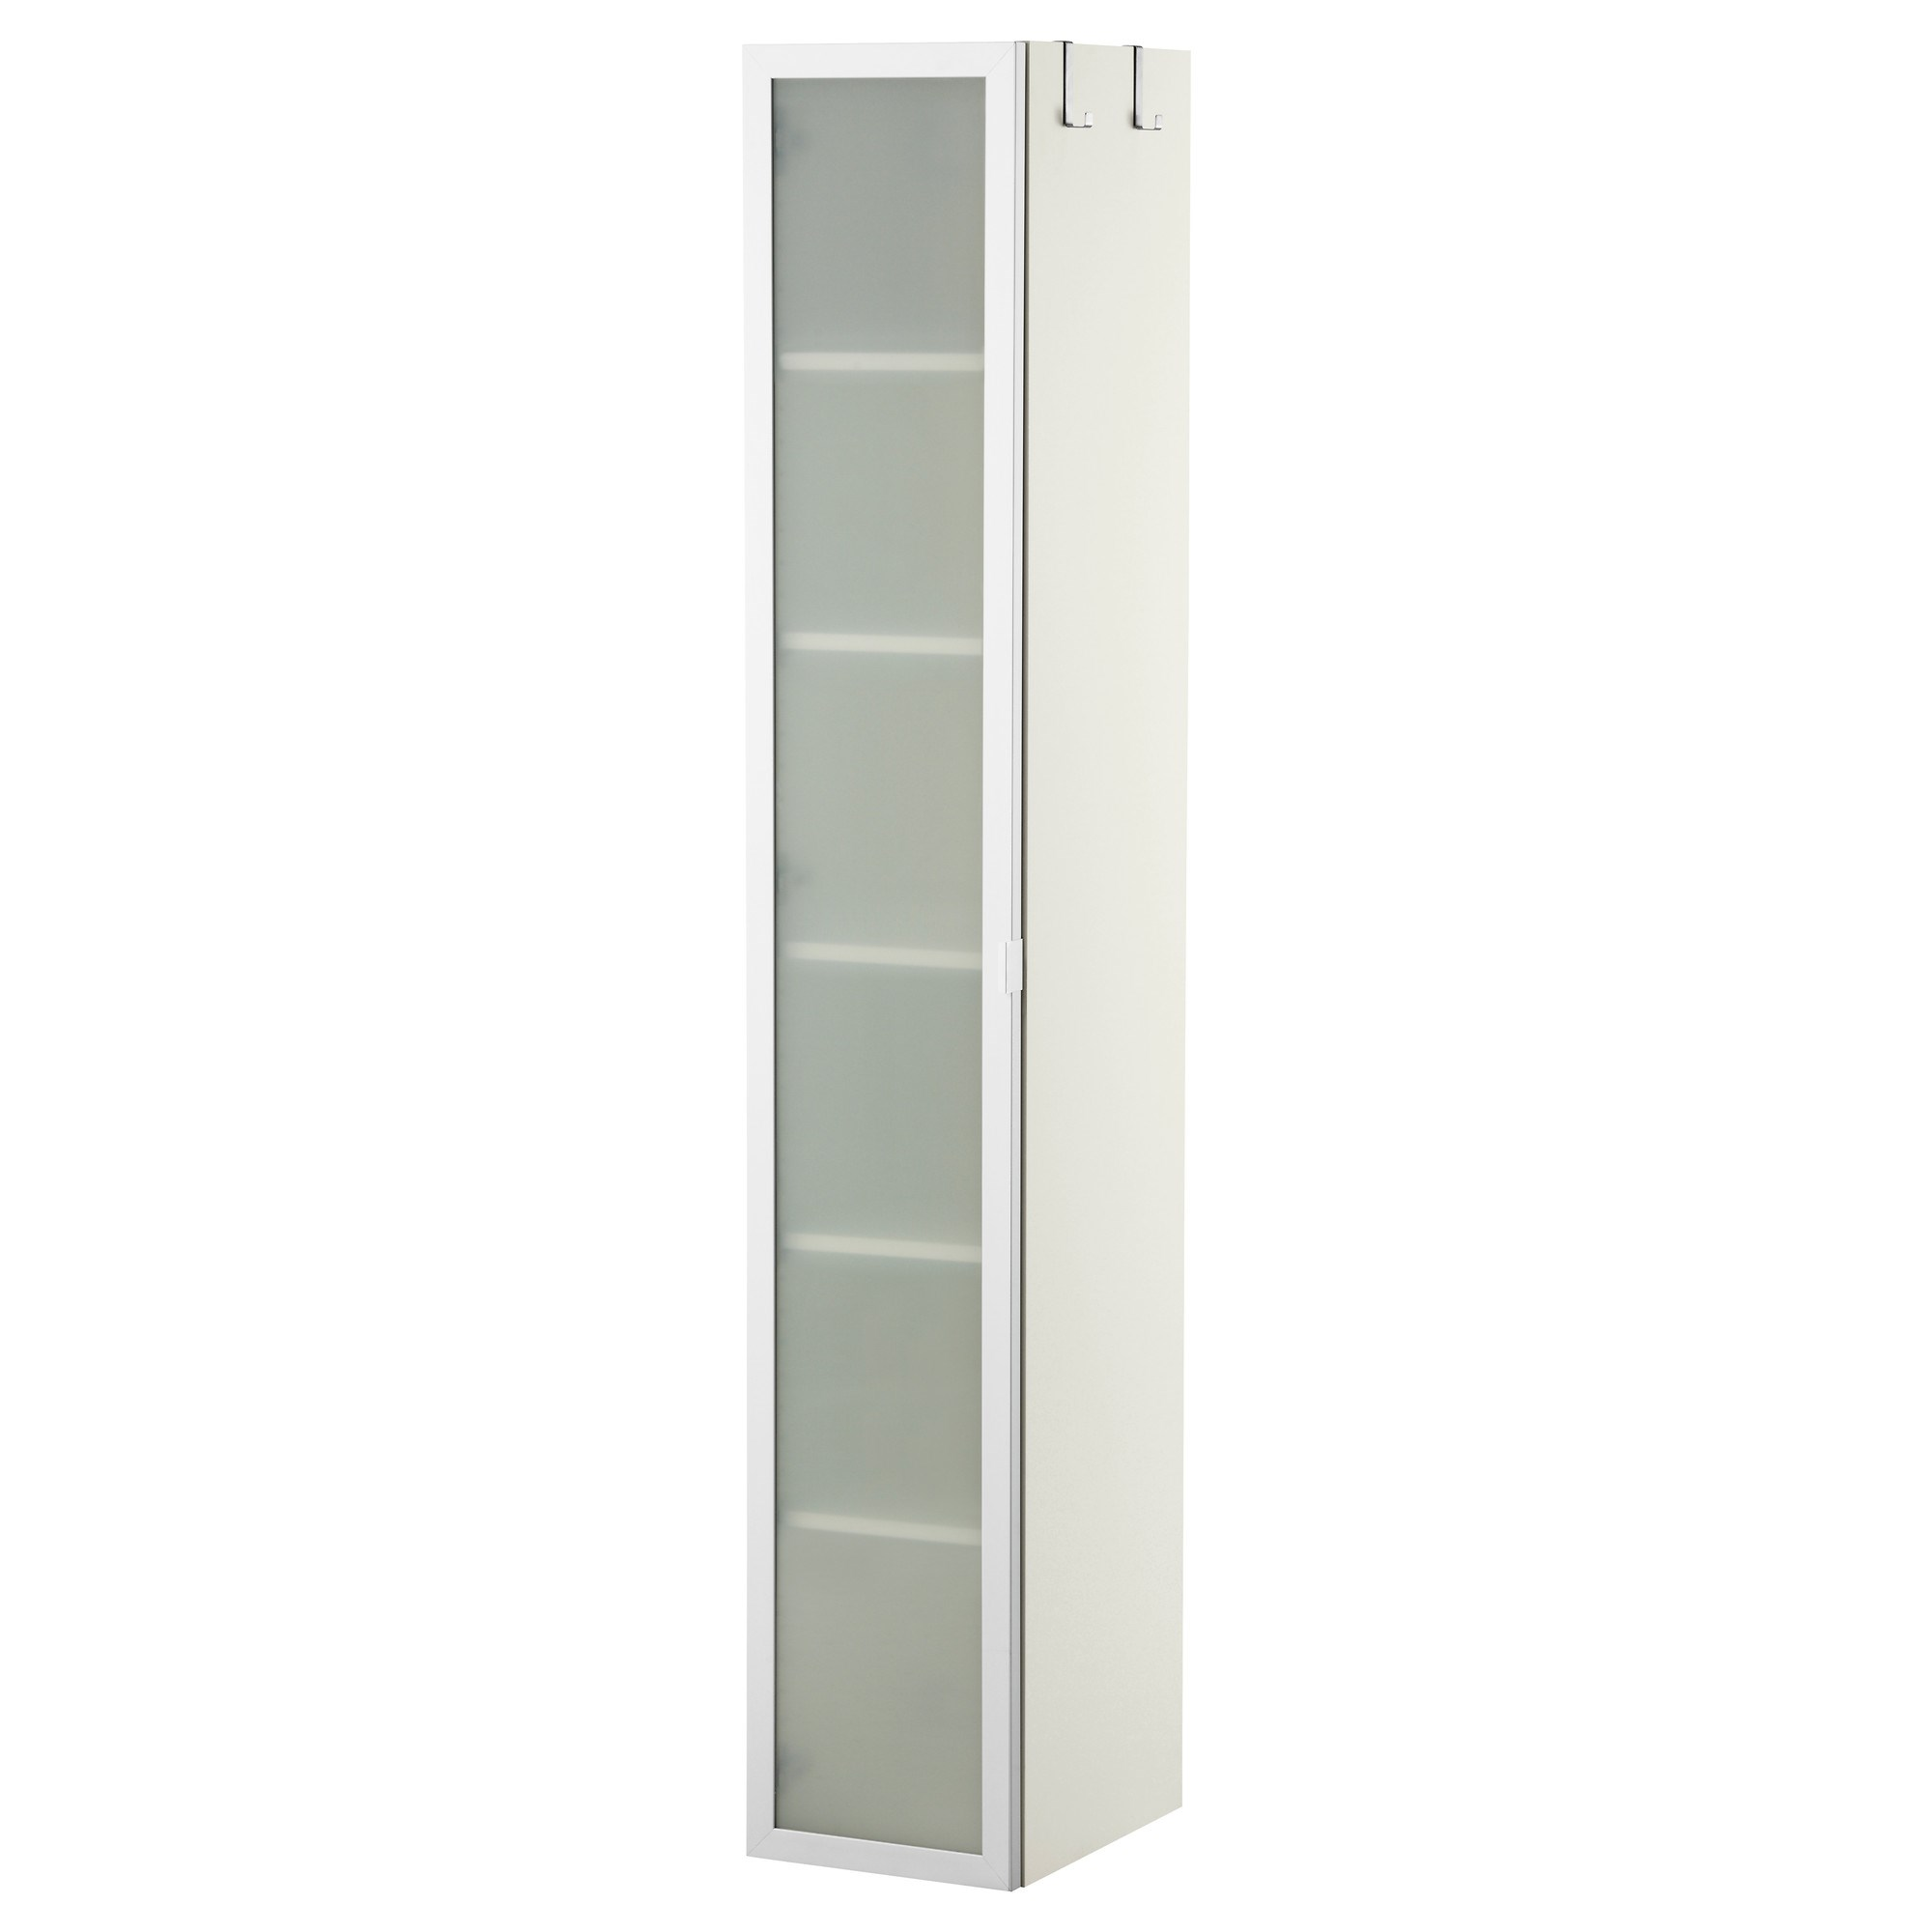 LILLANGEN high cabinet white/aluminium 30x38x179 cm   IKEA Bathroom